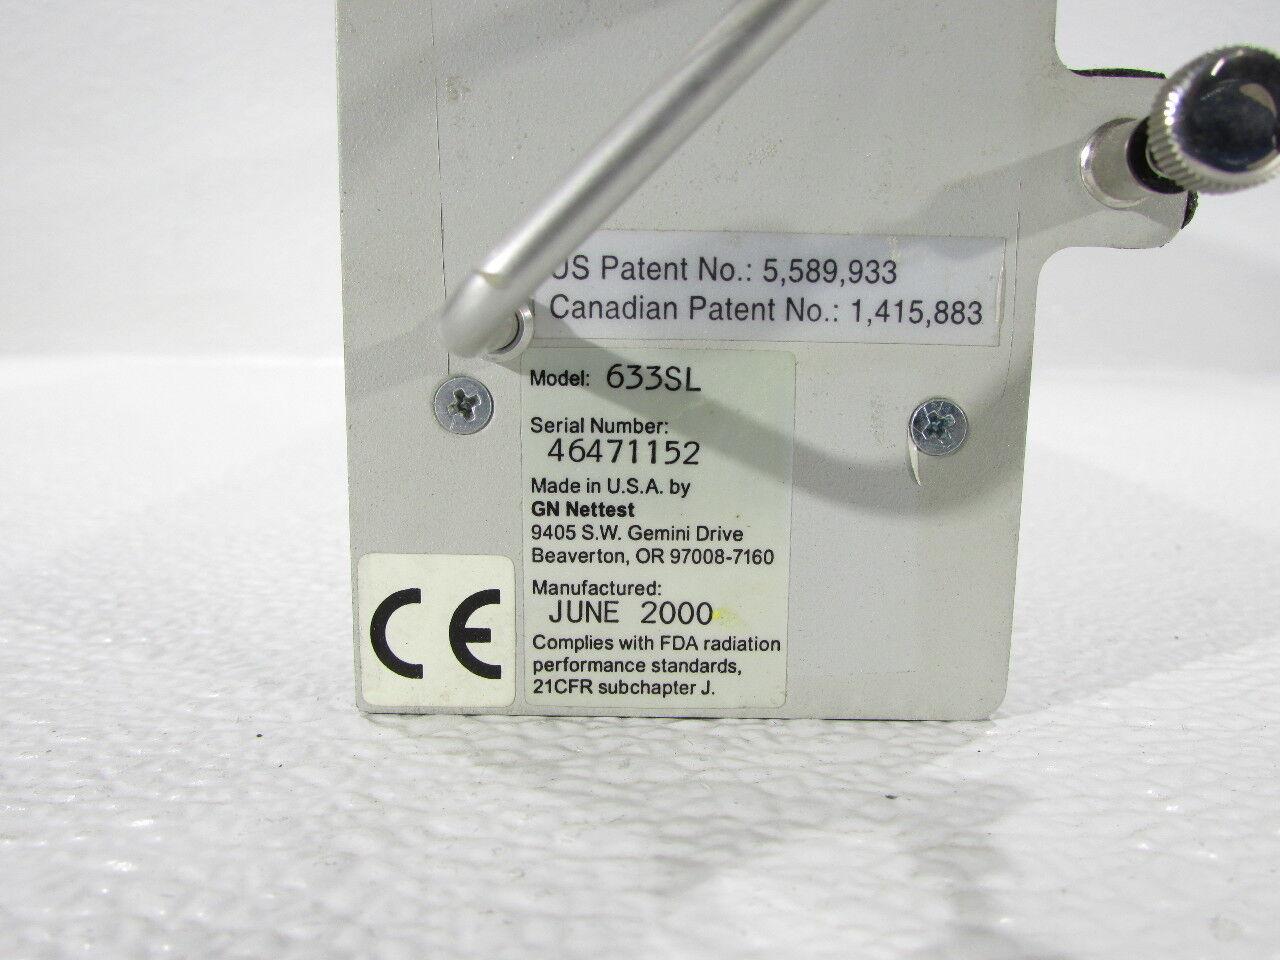 Gn Nettest Nettest Nettest 633SL Module 443211